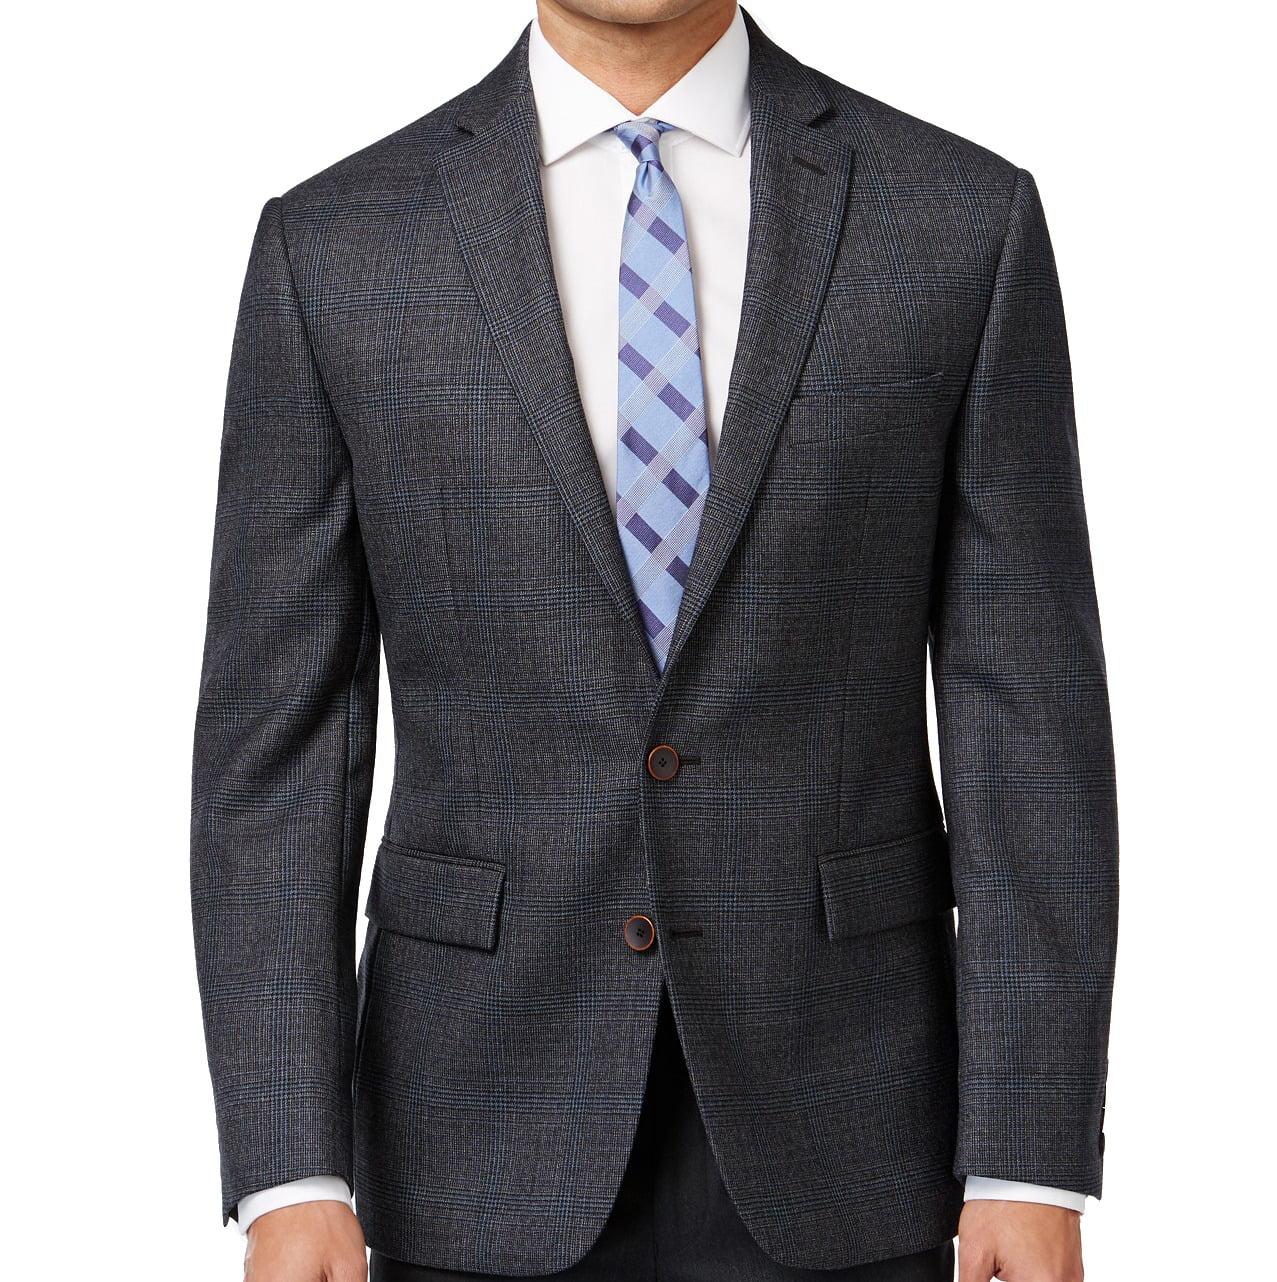 Ryan Seacrest Distiction New CharcoalGray Mens 40S Plaid Wool Jacket by Ryan Seacrest Distiction